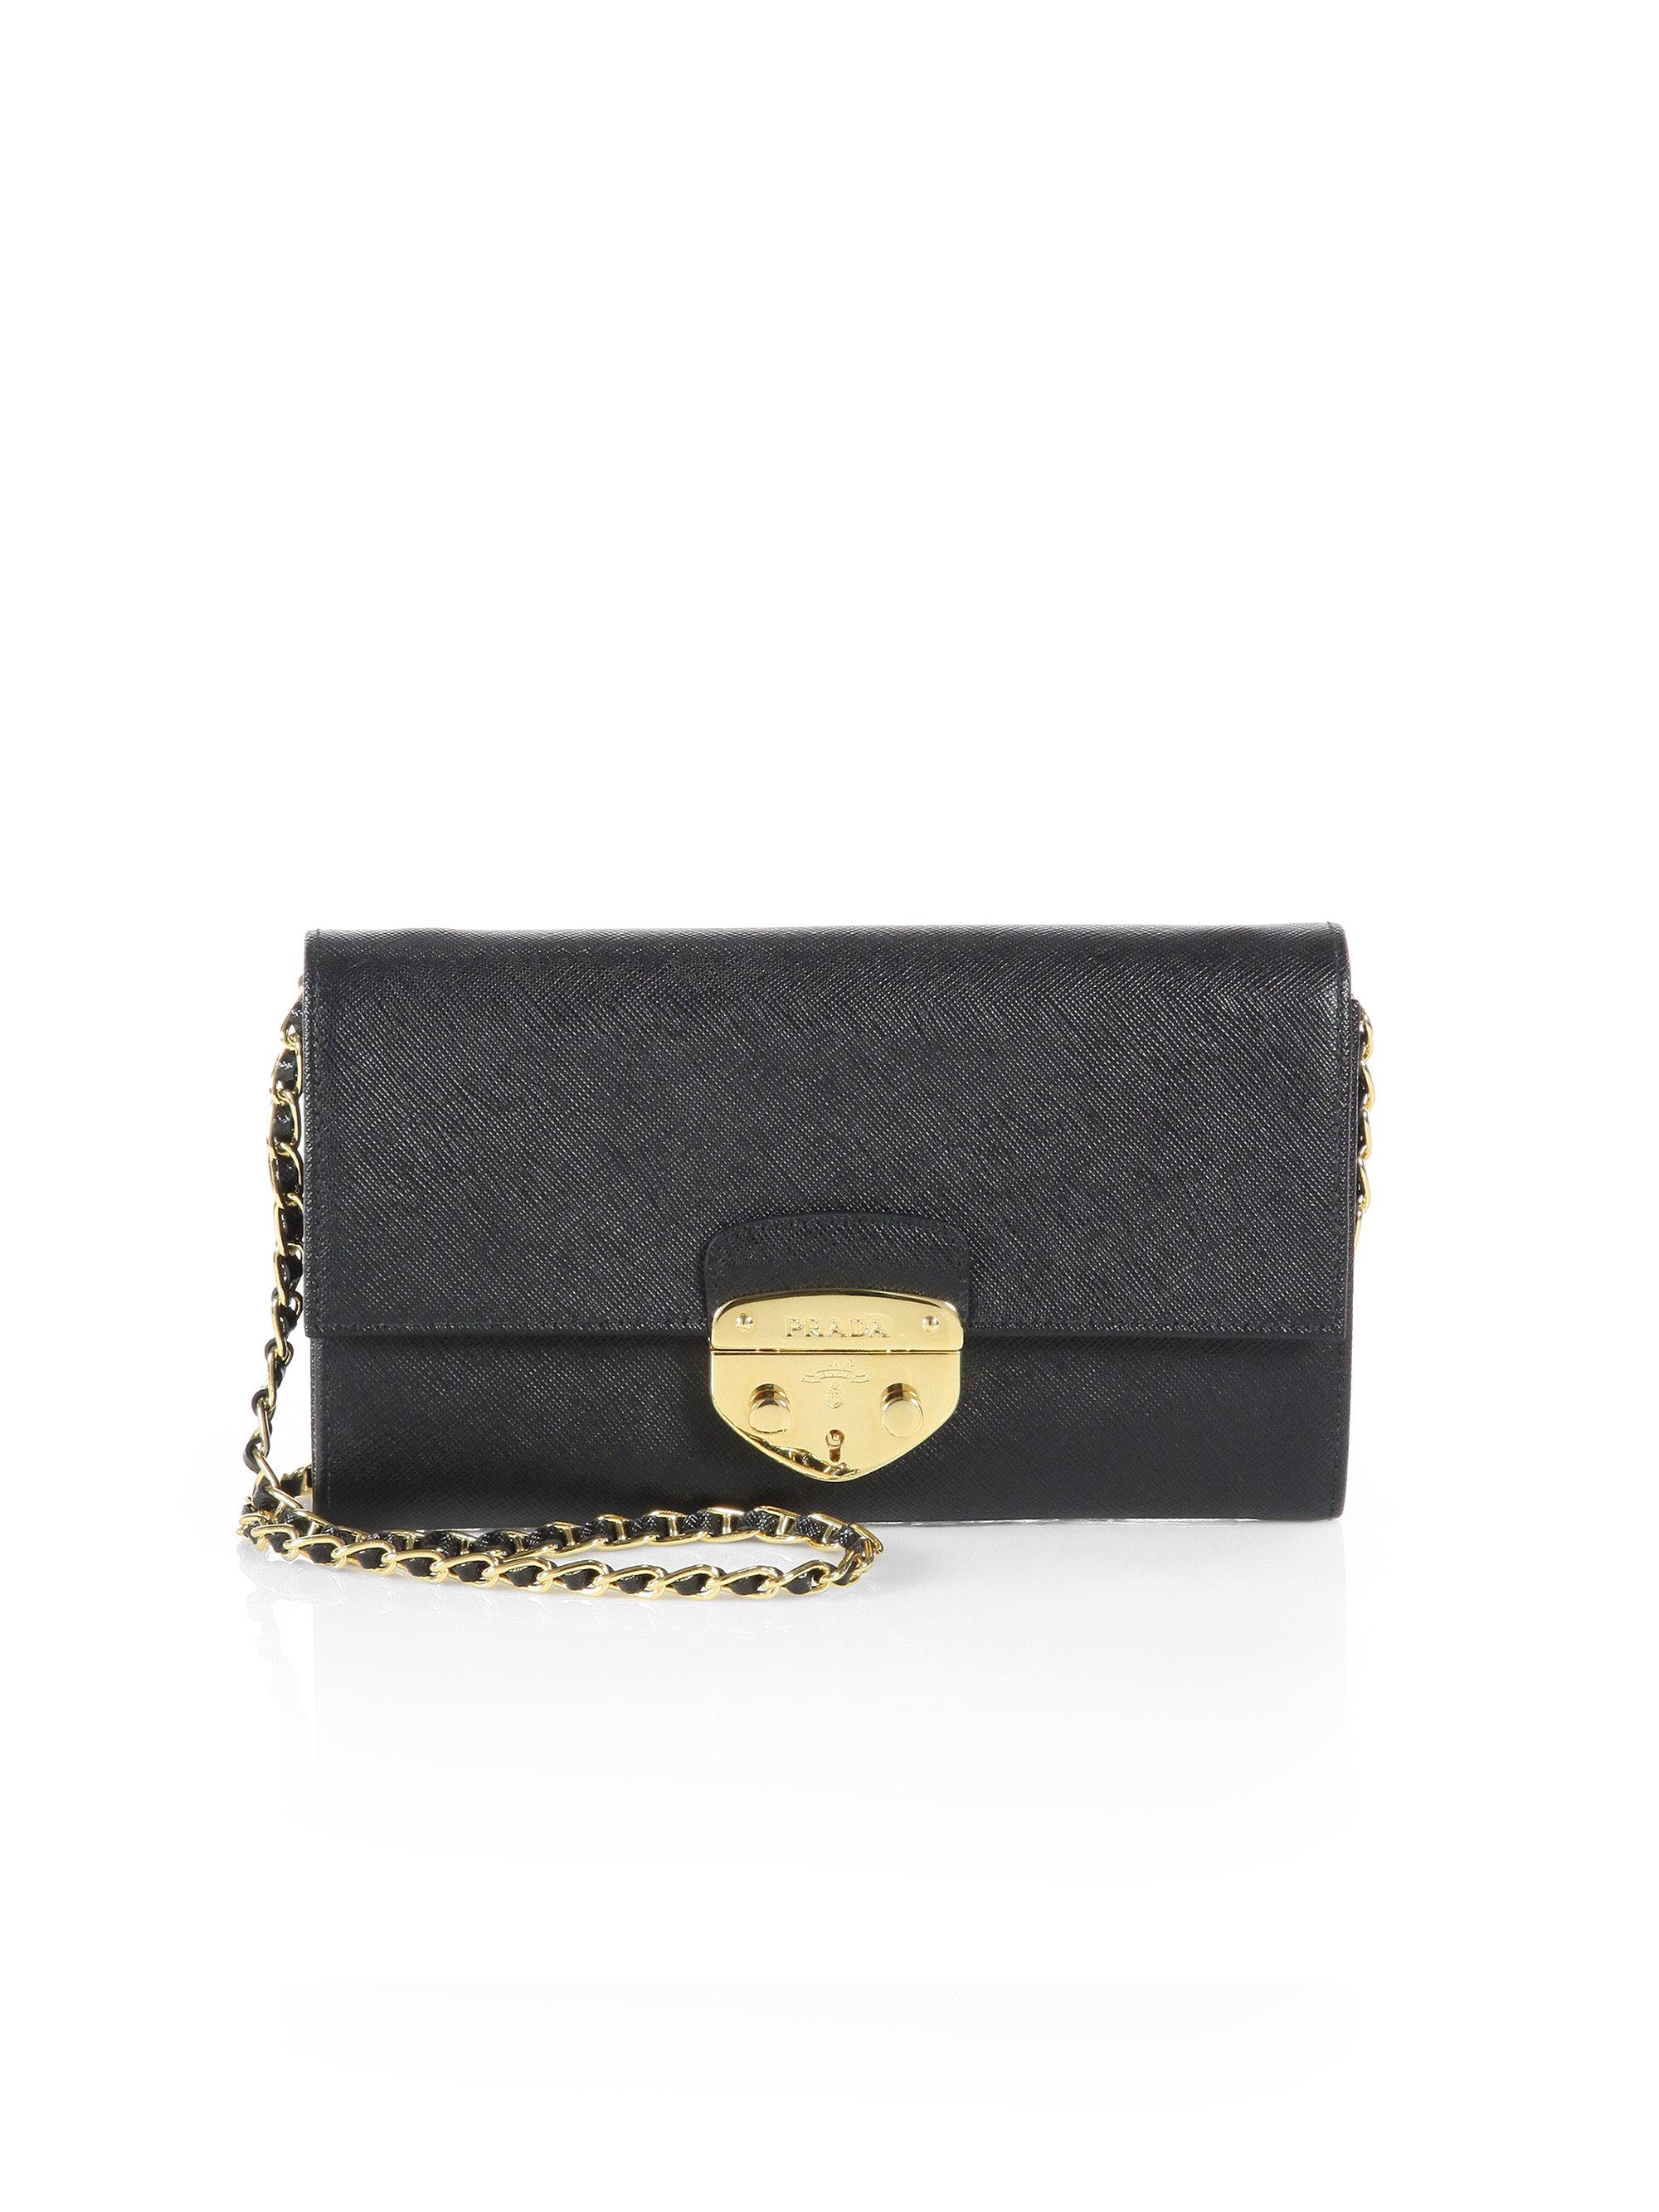 prada red handbag - Prada Saffiano Lux Convertible Chain Wallet in Gray (GREEN) | Lyst